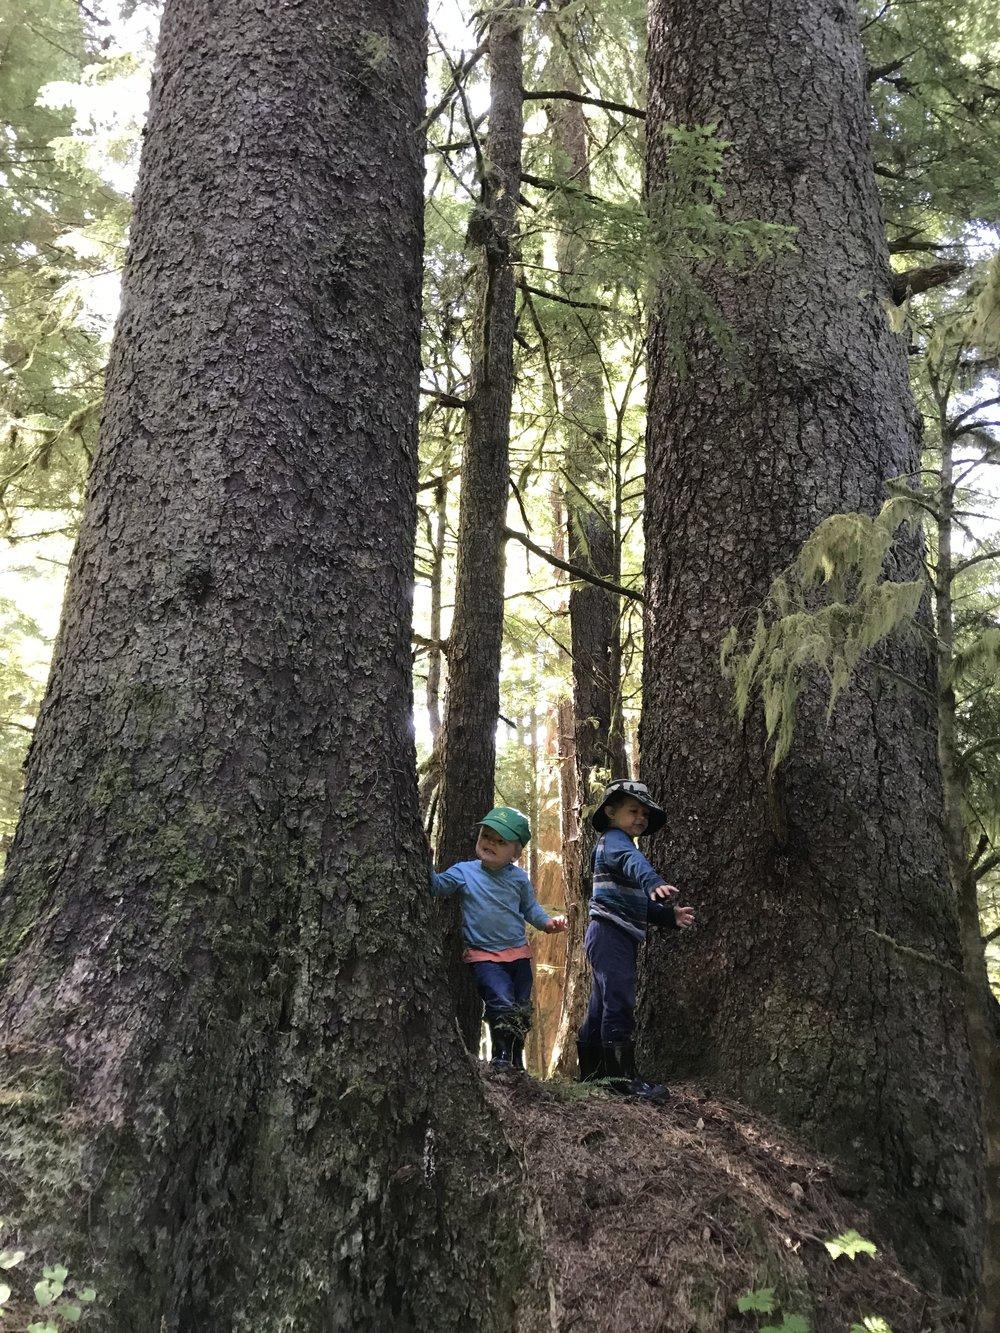 Big trees, good climbing.